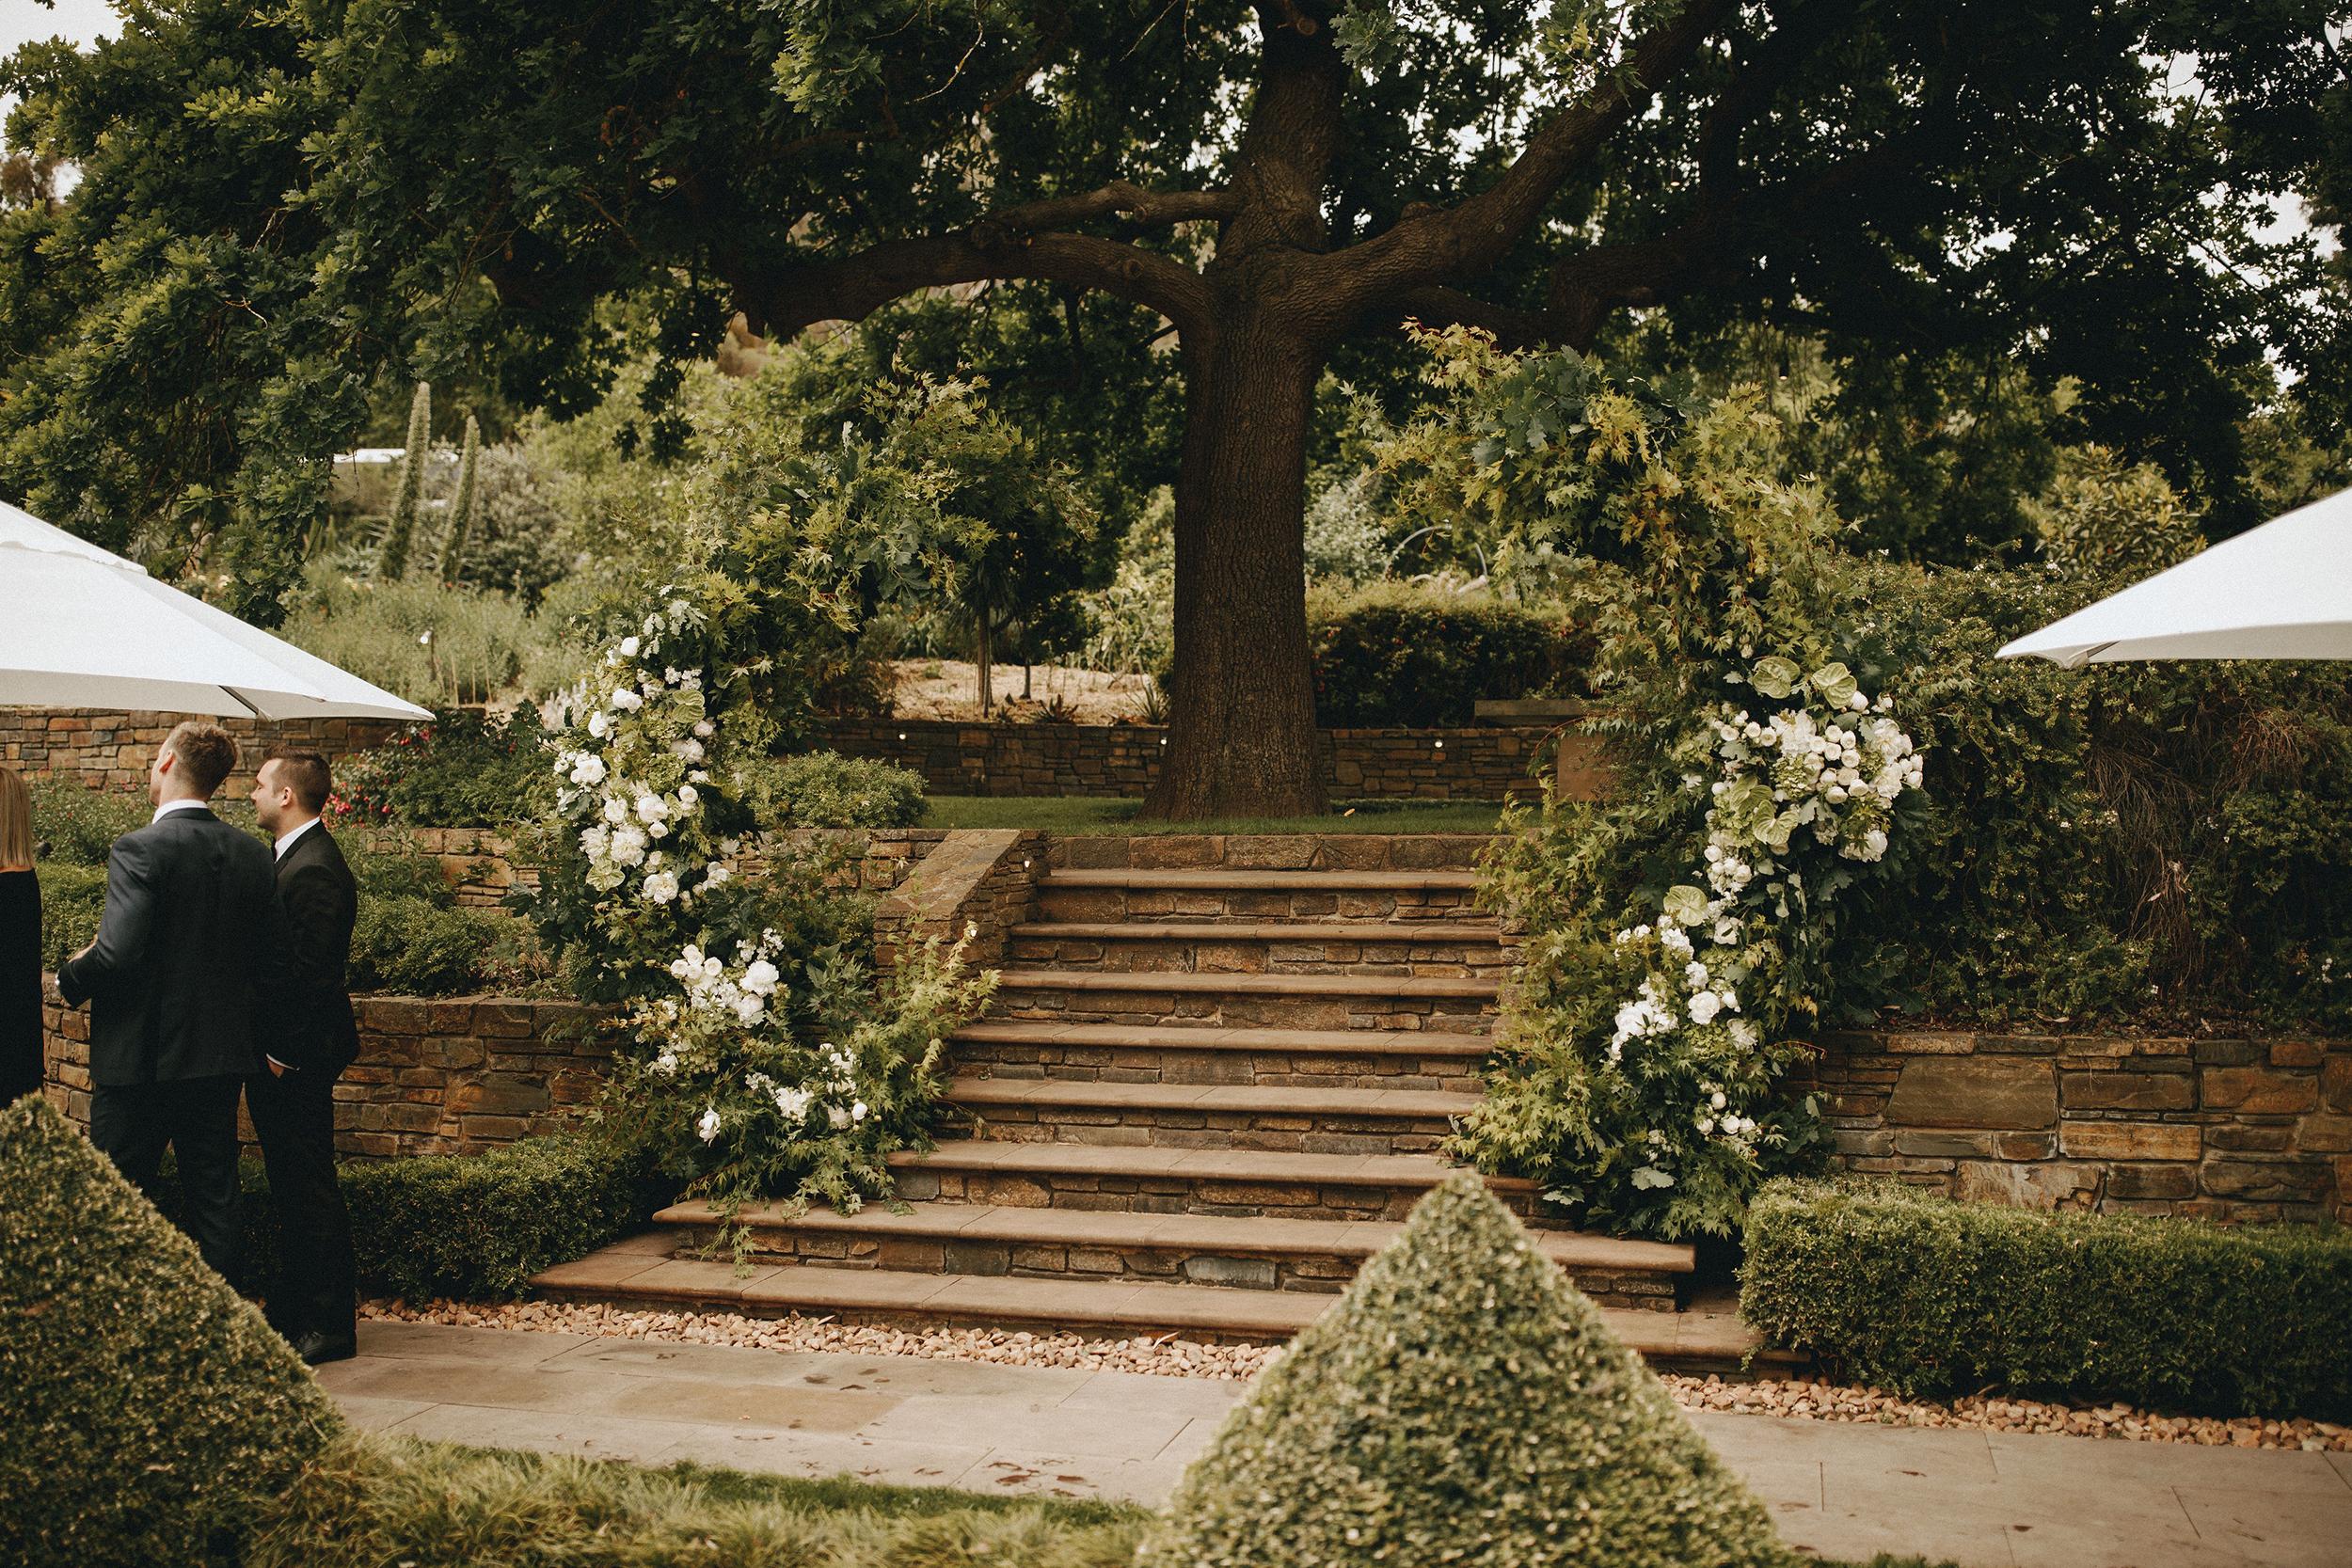 BYBHS_HYGGE_WEDDING_DAN&BEC_HI-RES_1.jpg